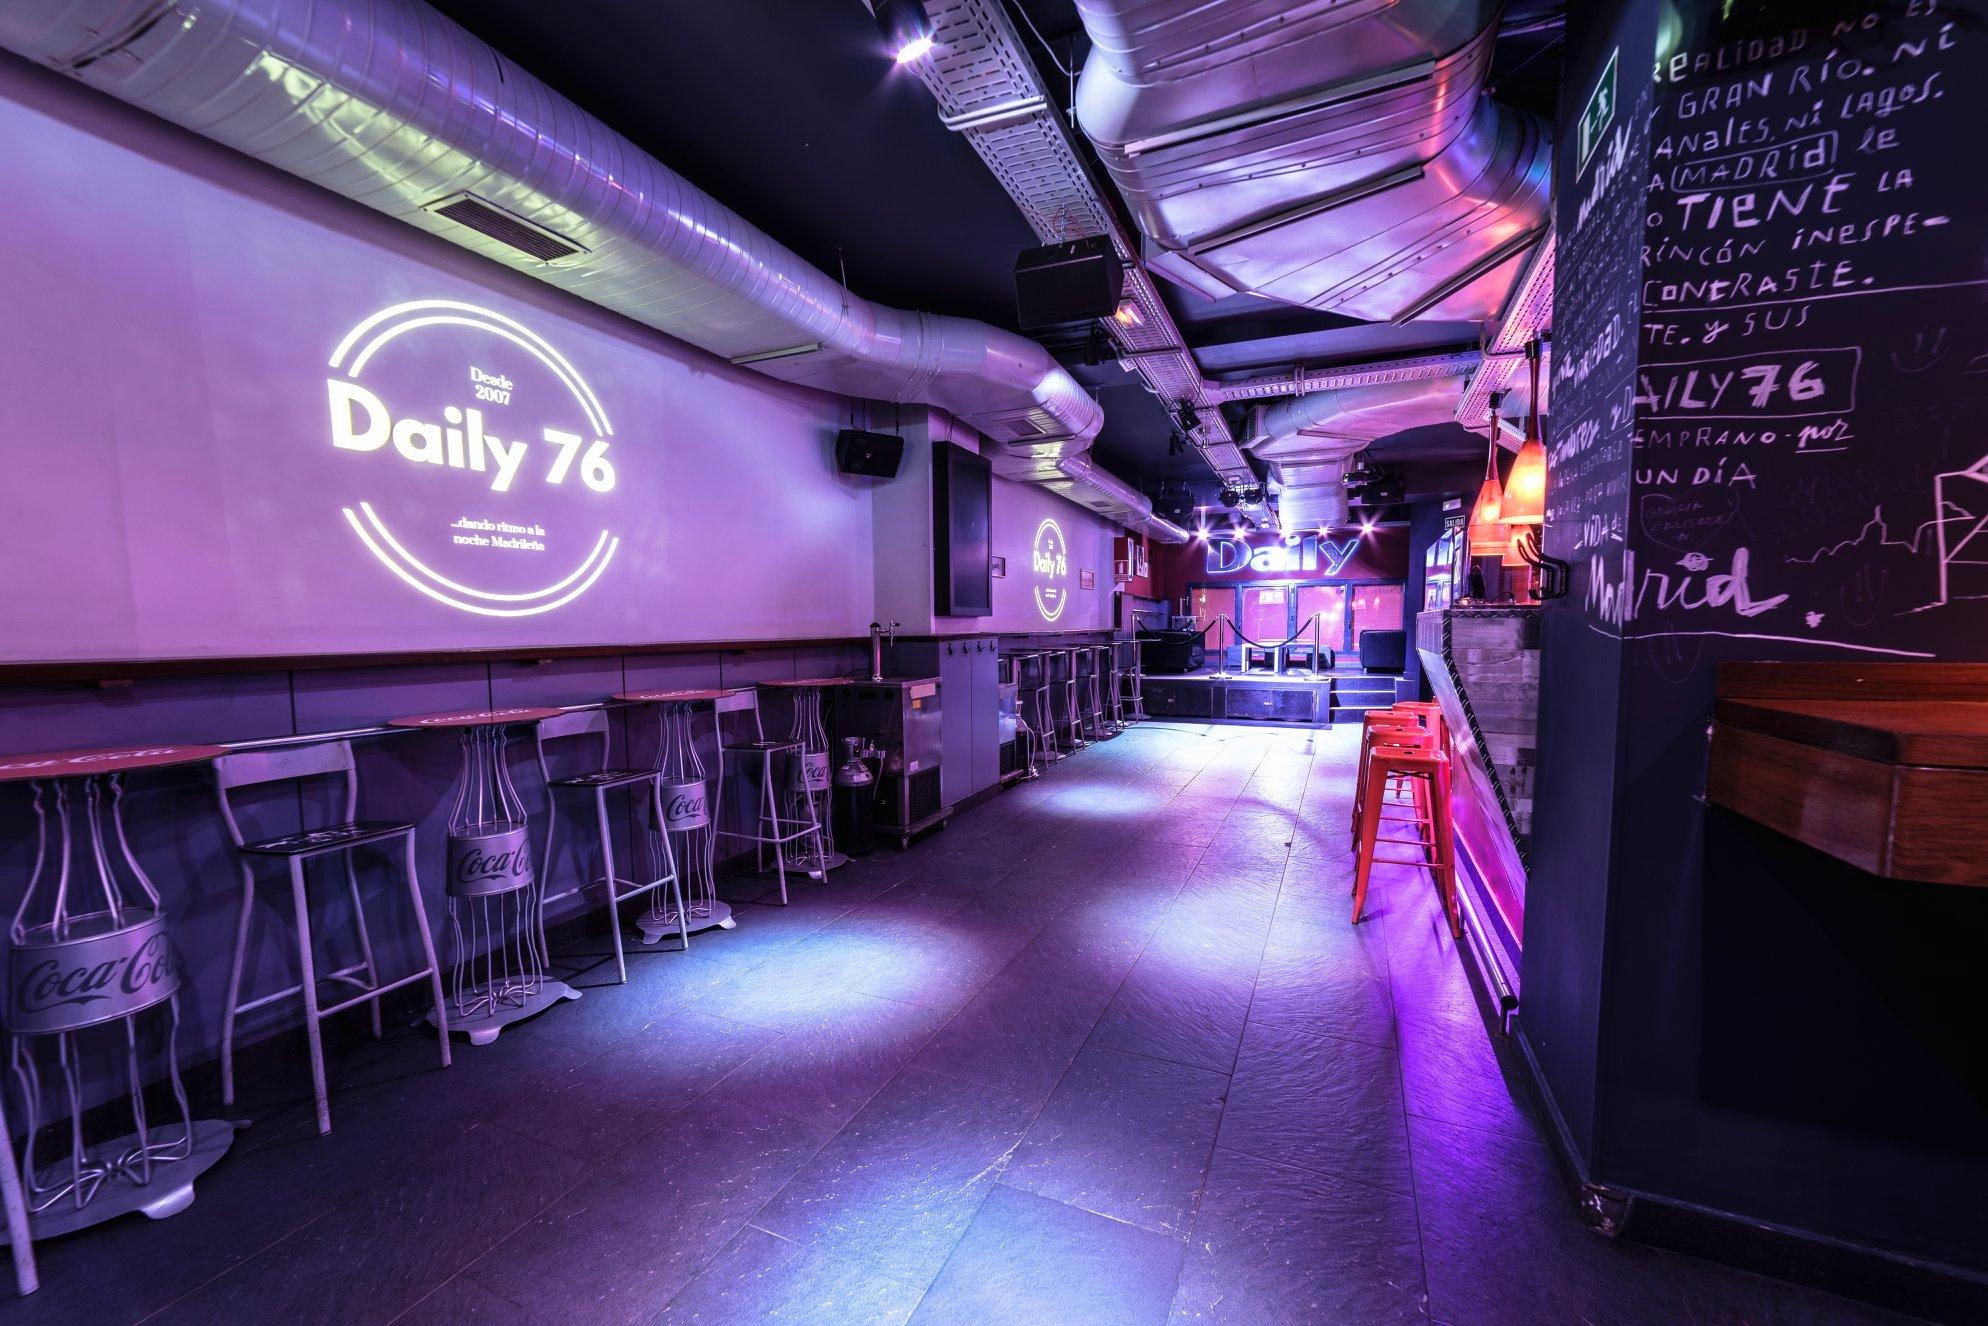 Fotos de la zona primcipal del bar